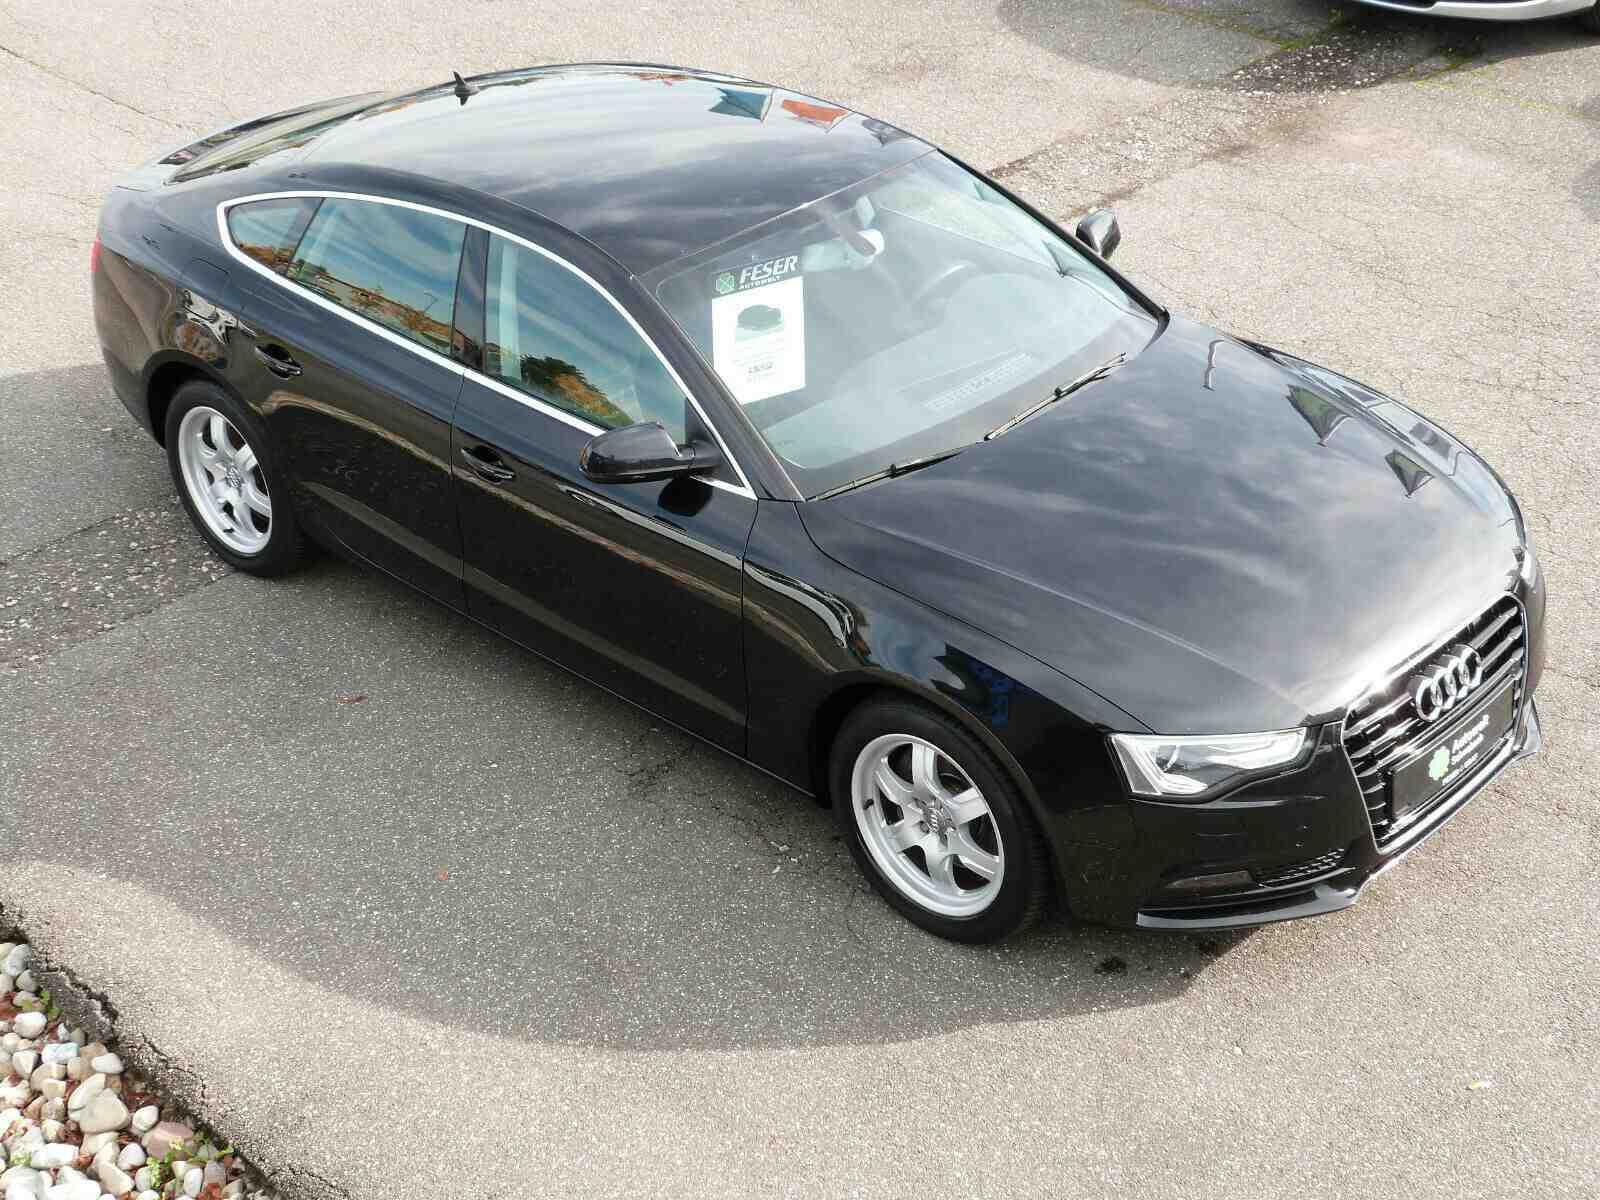 Audi A5 Sportback 2.0 TFSI NAVI XENON SHZ PDC SOUND, Jahr 2014, Benzin